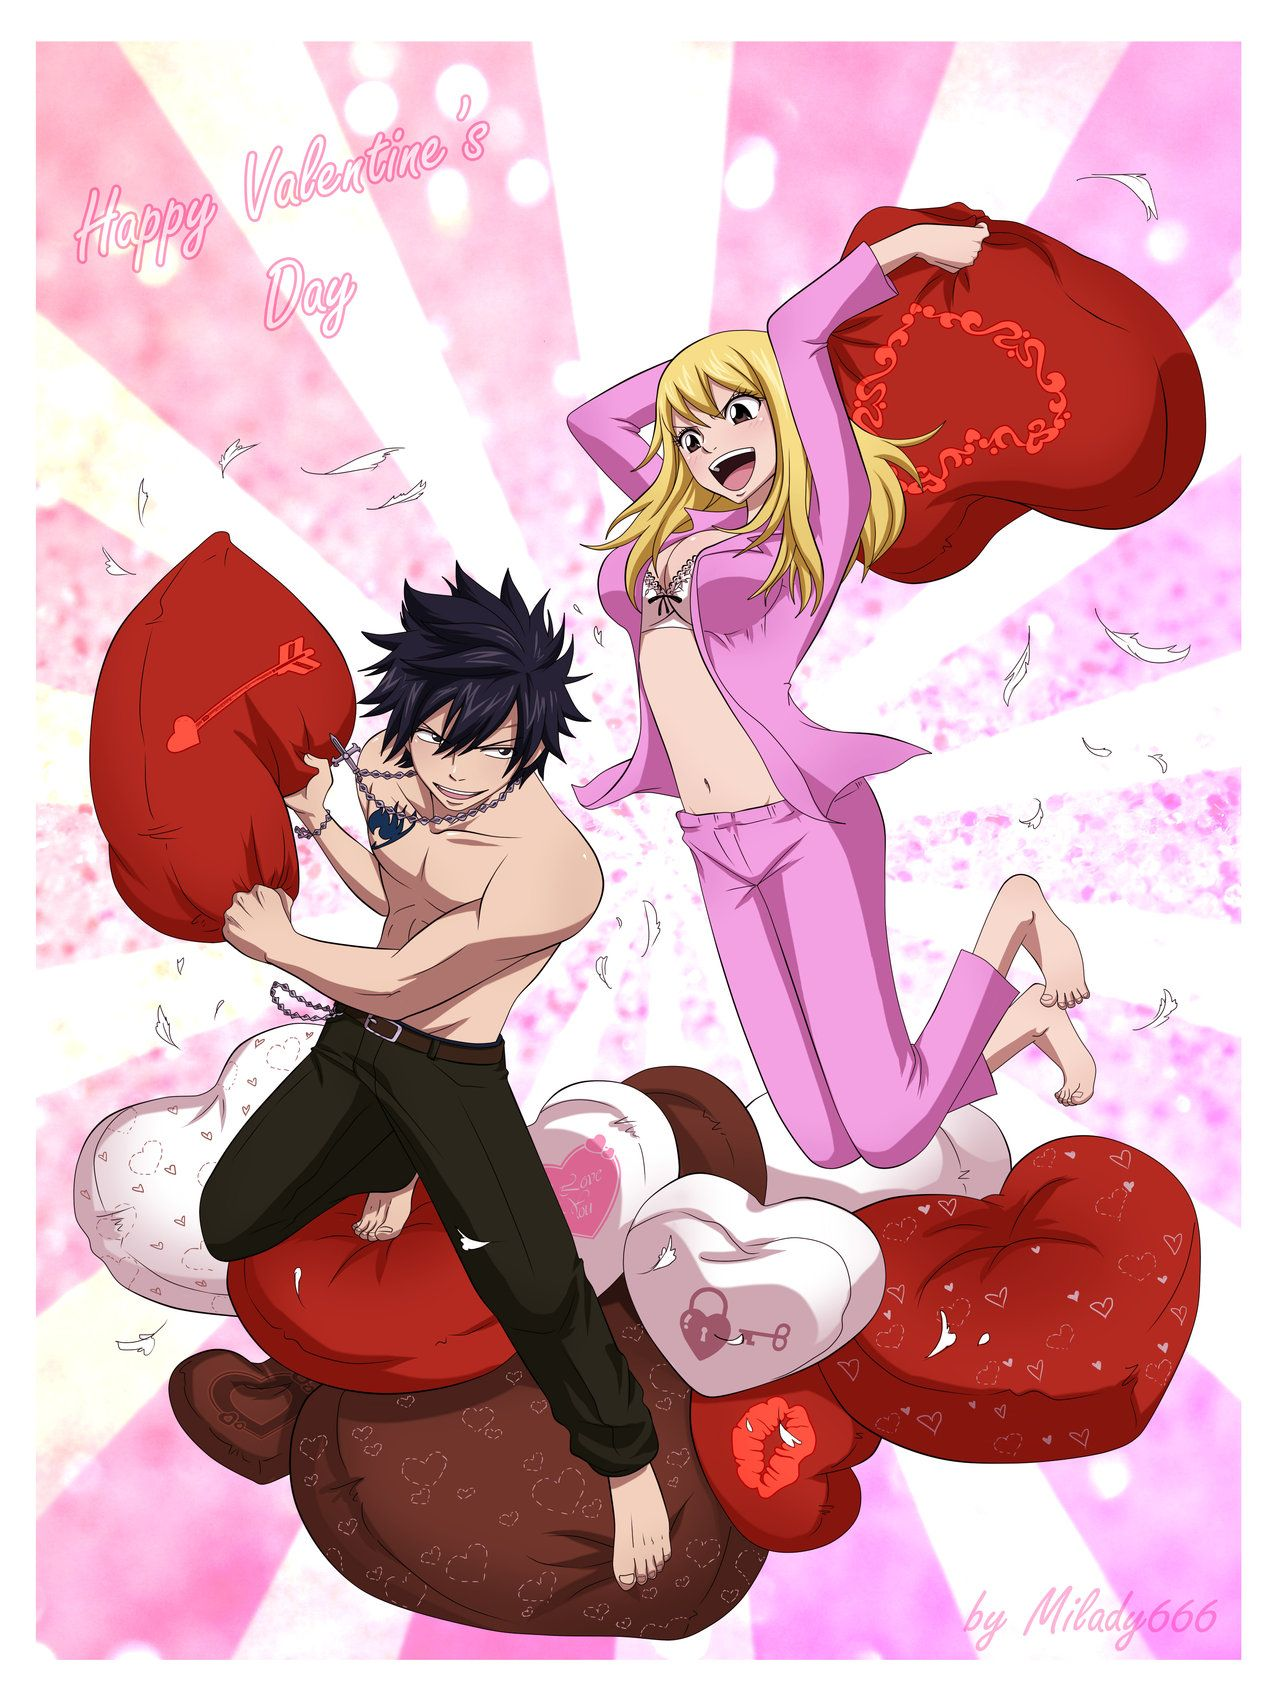 Anime Valentine S Day Happy Valentine S Day By Milady666 On